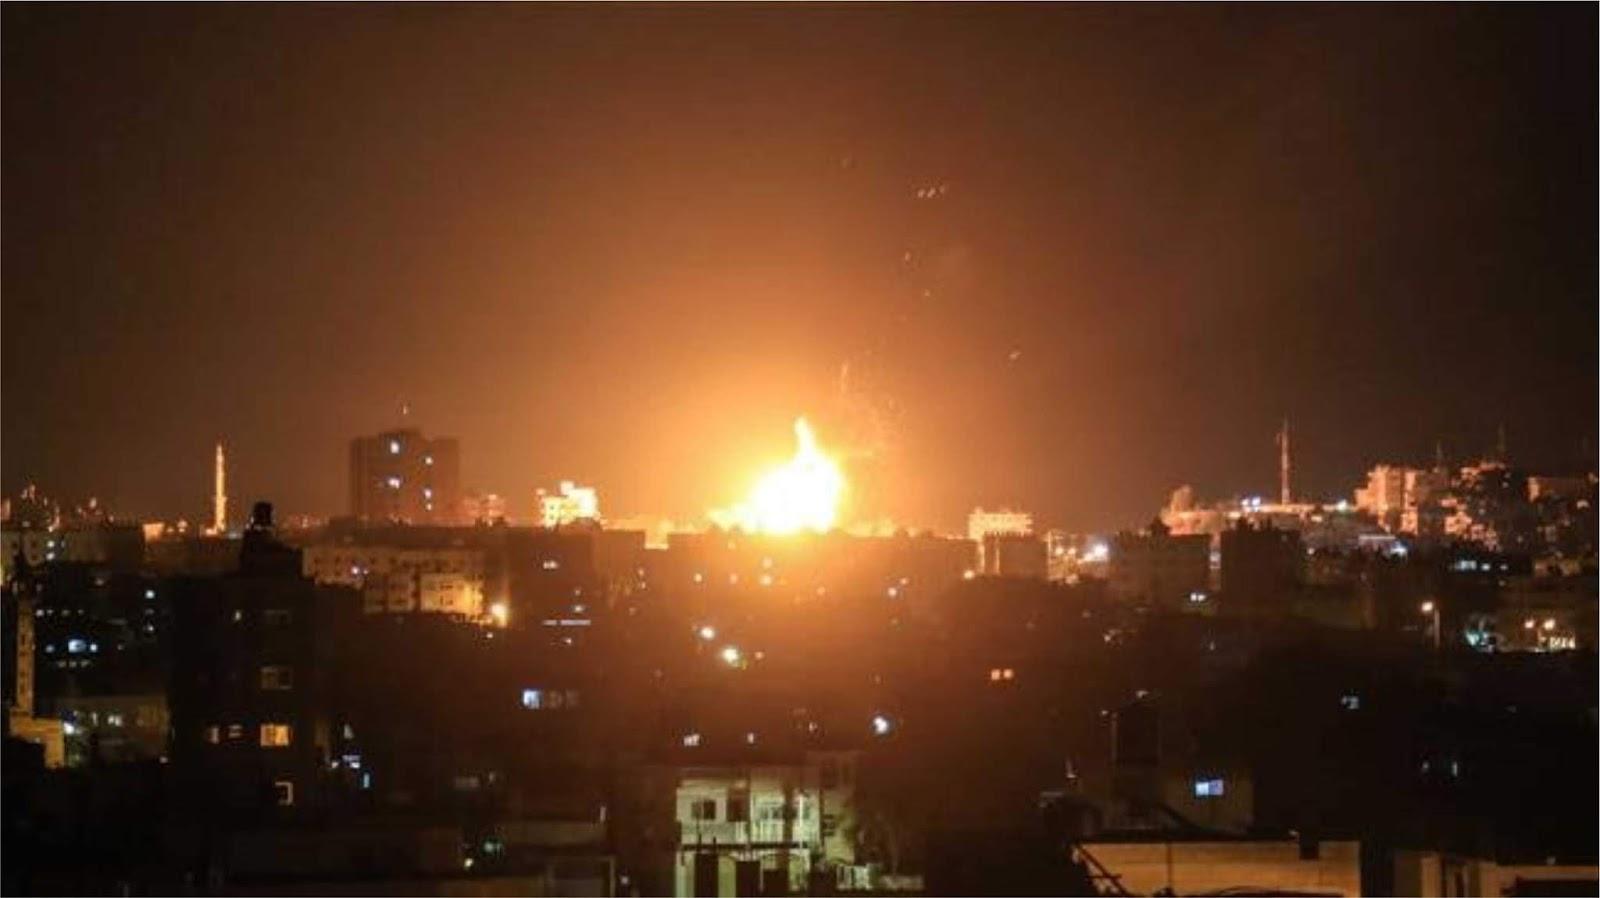 Angkatan udara Israel melancarkan serangan rudal ke Gaza